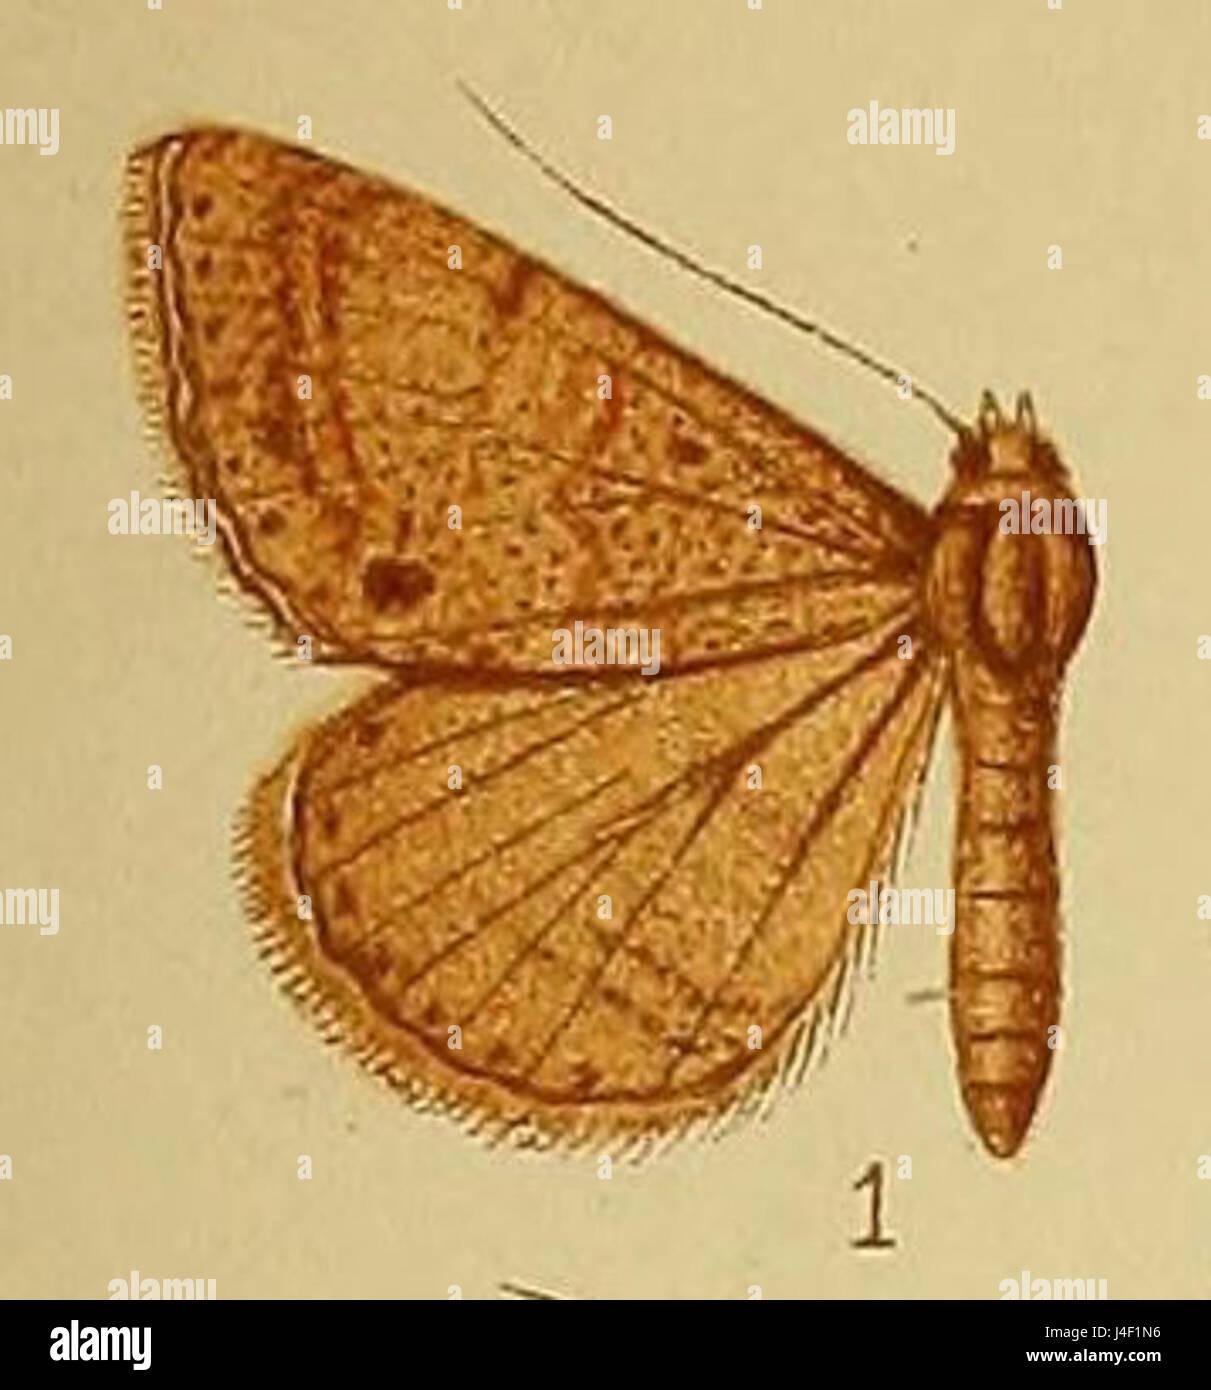 Pl.38 01 Plecoptera grisea Hampson  1910 - Stock Image